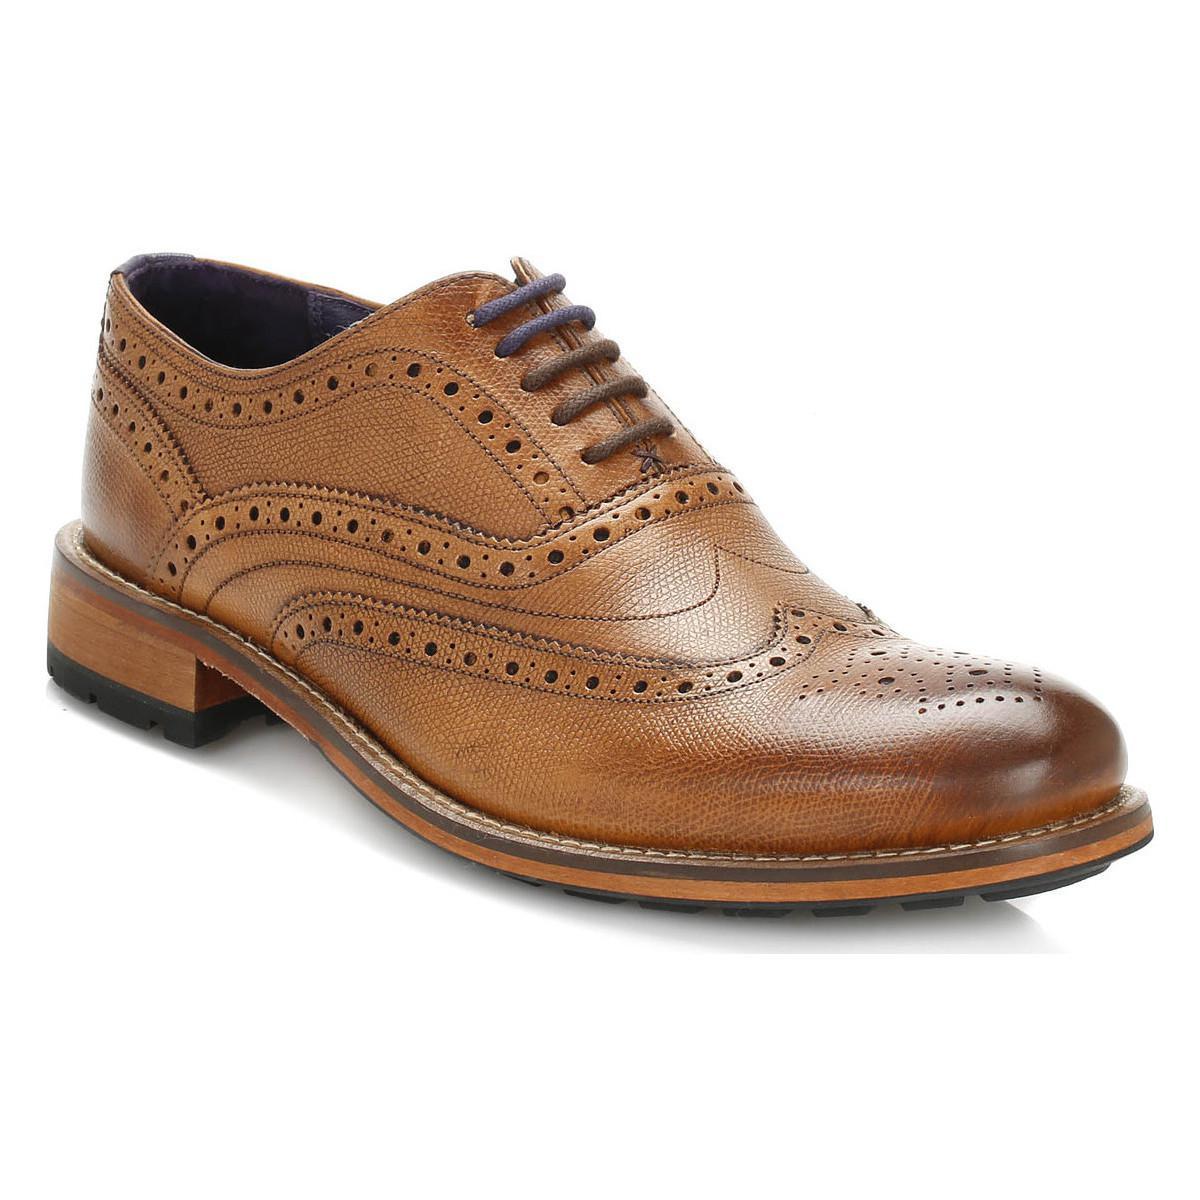 6a77354948325e Ted Baker Mens Tan Guri 8 Leather Brogue Shoes Men s Smart   Formal ...